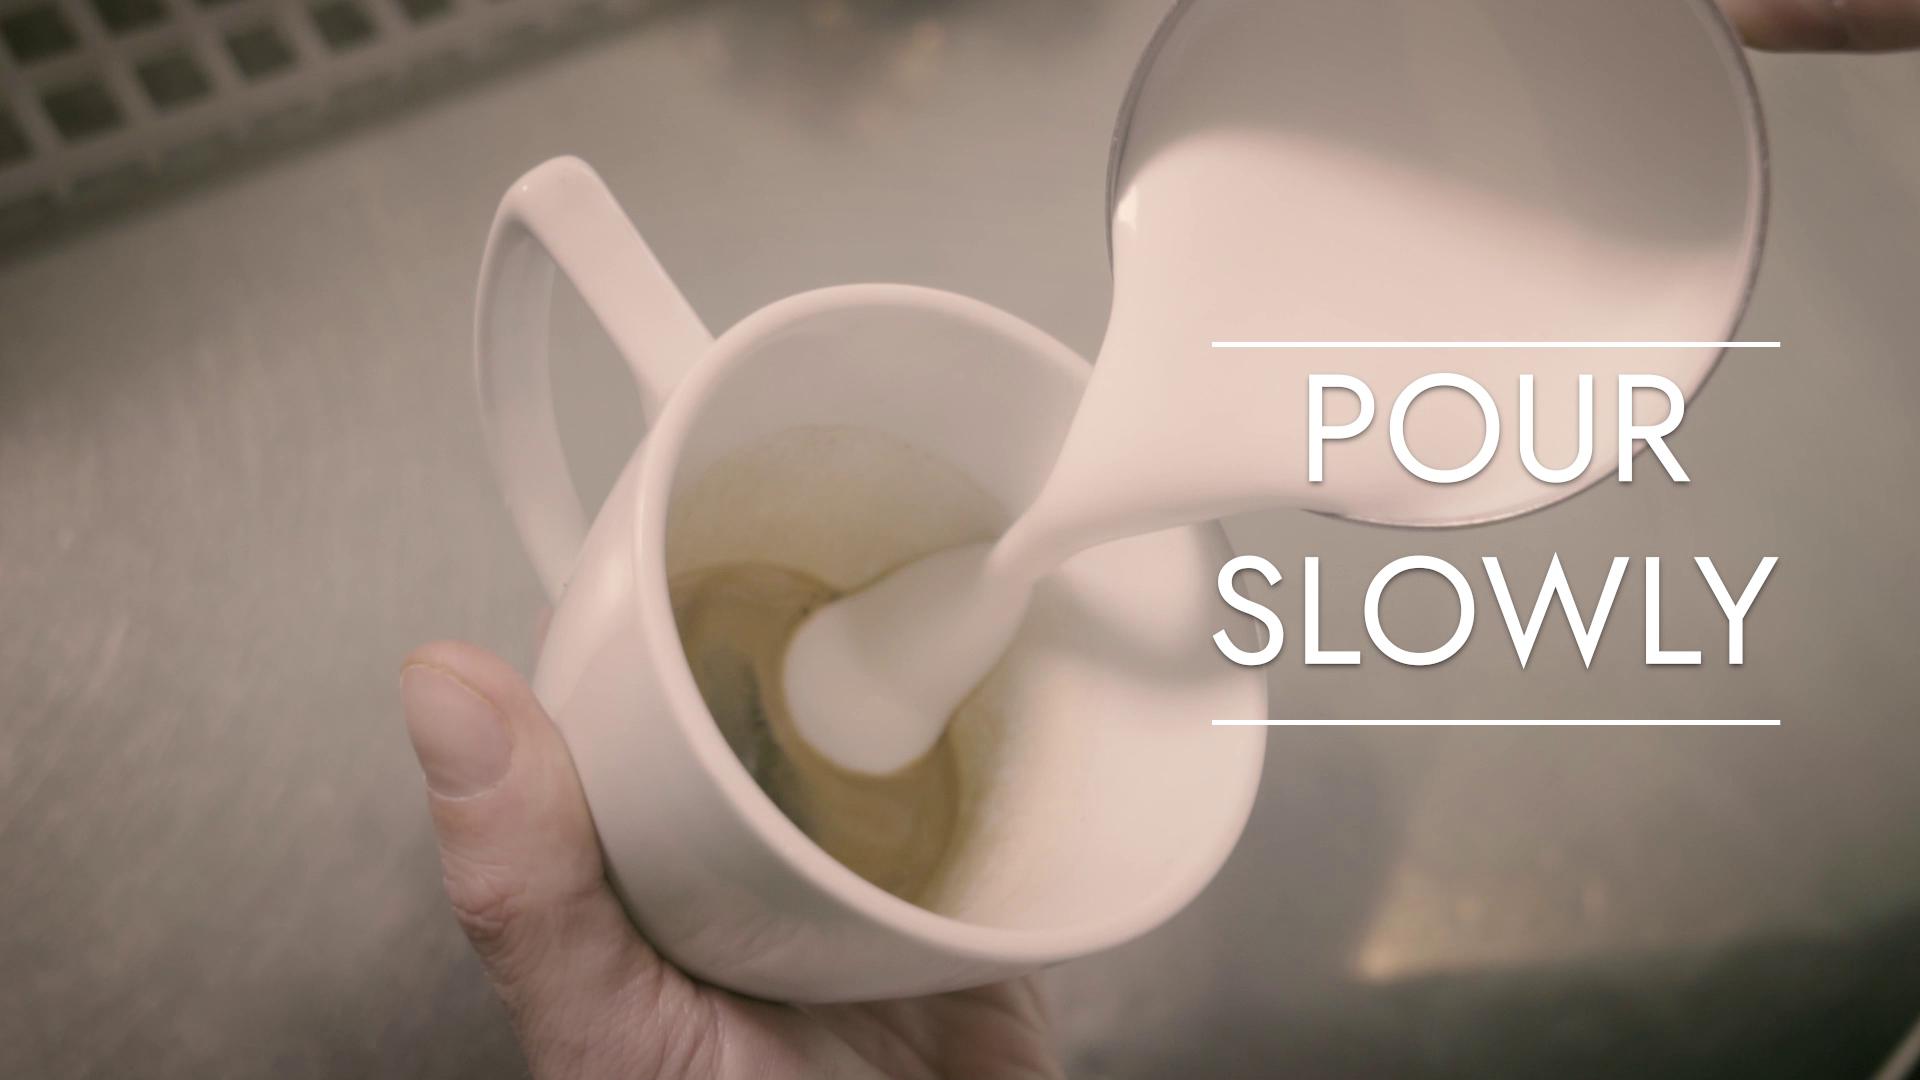 MASTER OF CAPPUCCINO: preparare un cappuccino a regola d'arte